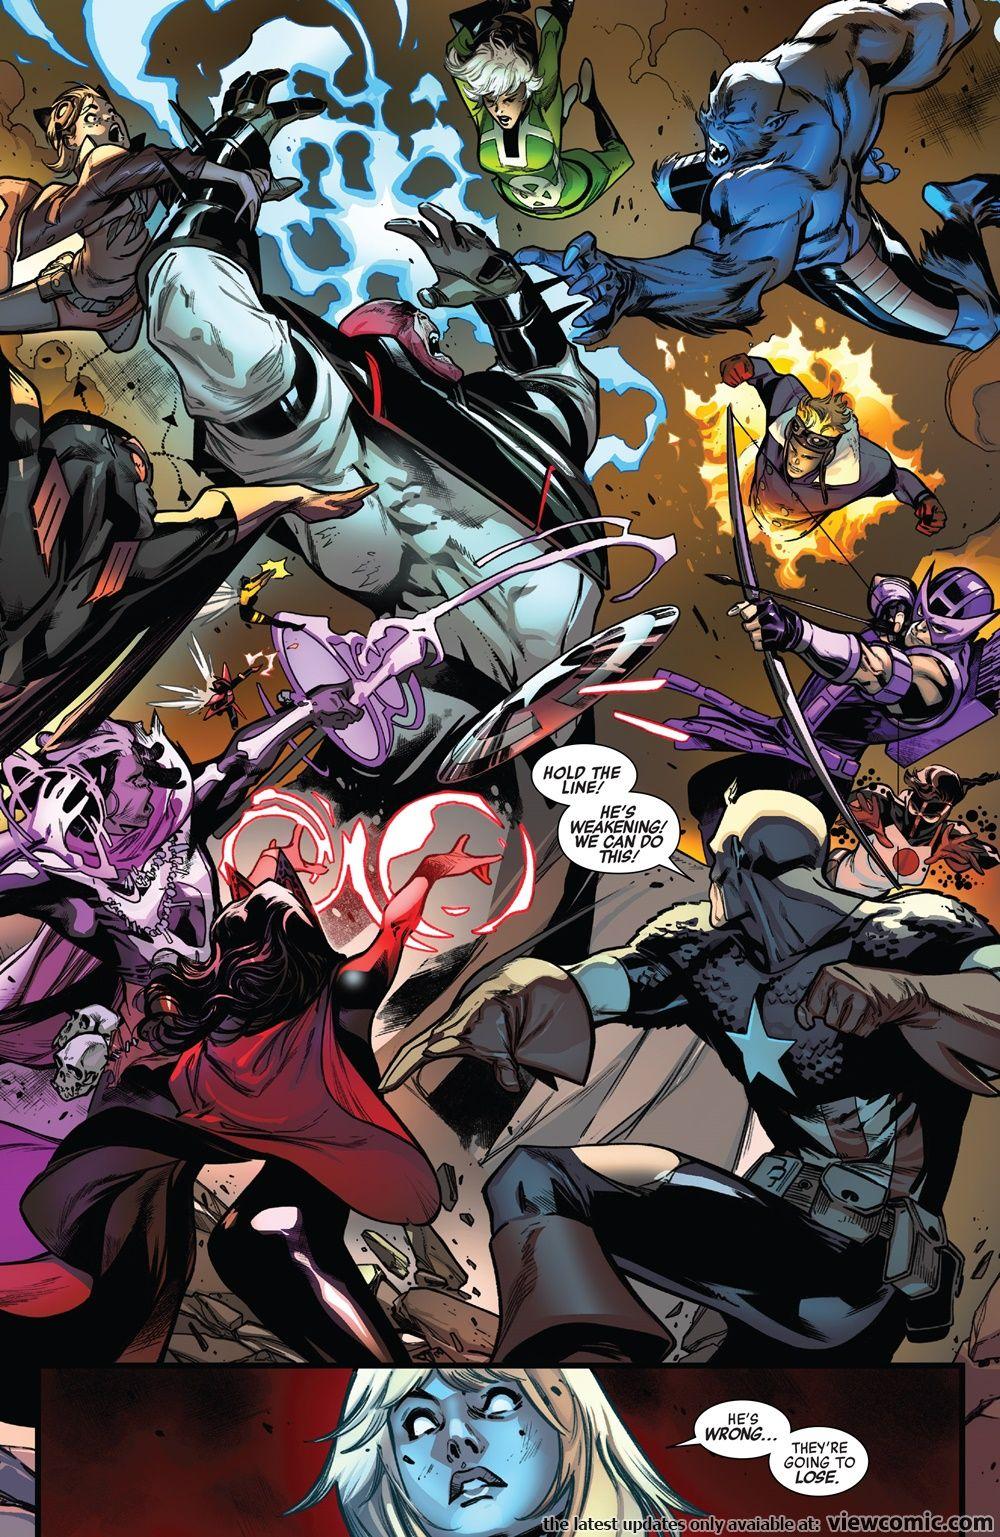 Avengers v6 689 (2018) ……………………… | View Comic | New my